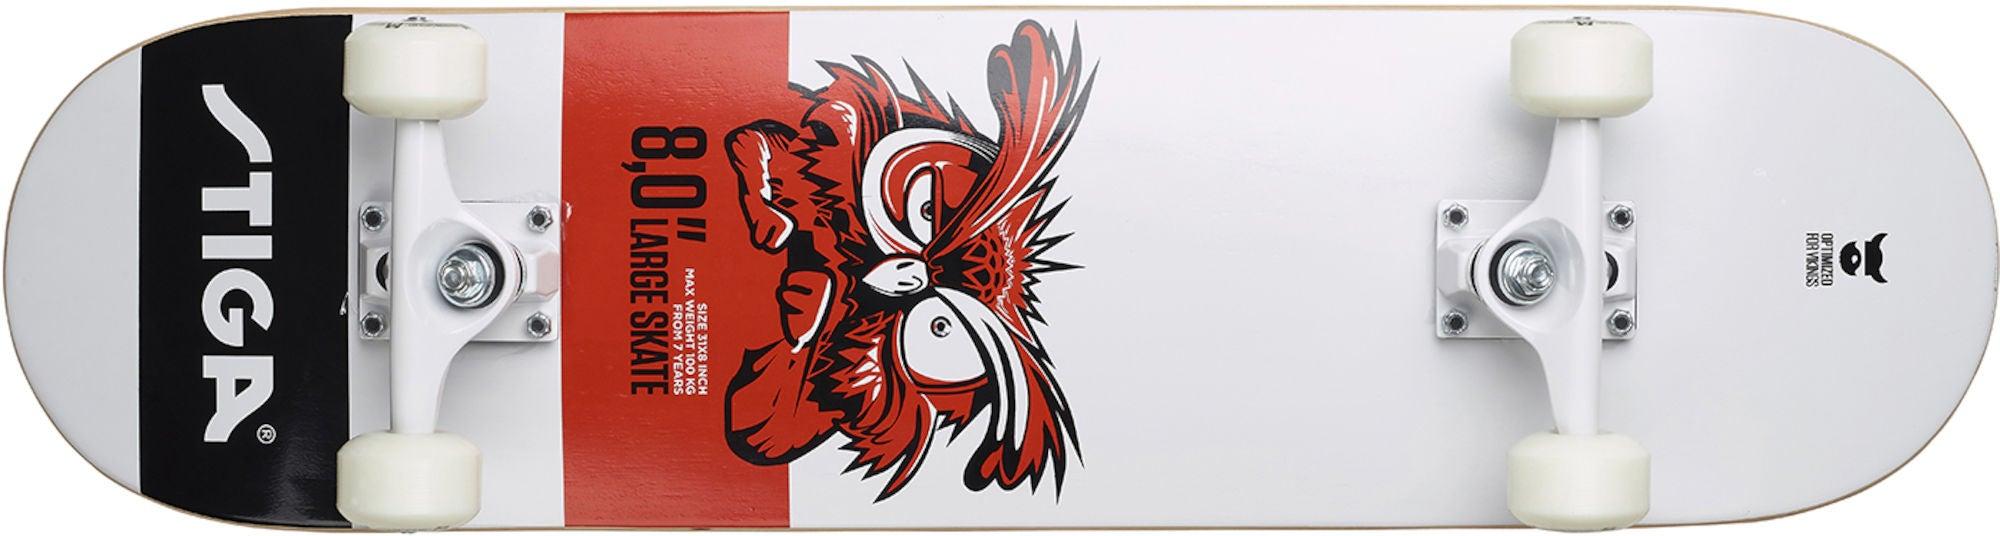 STIGA Skateboard Owl 8.0 Vit